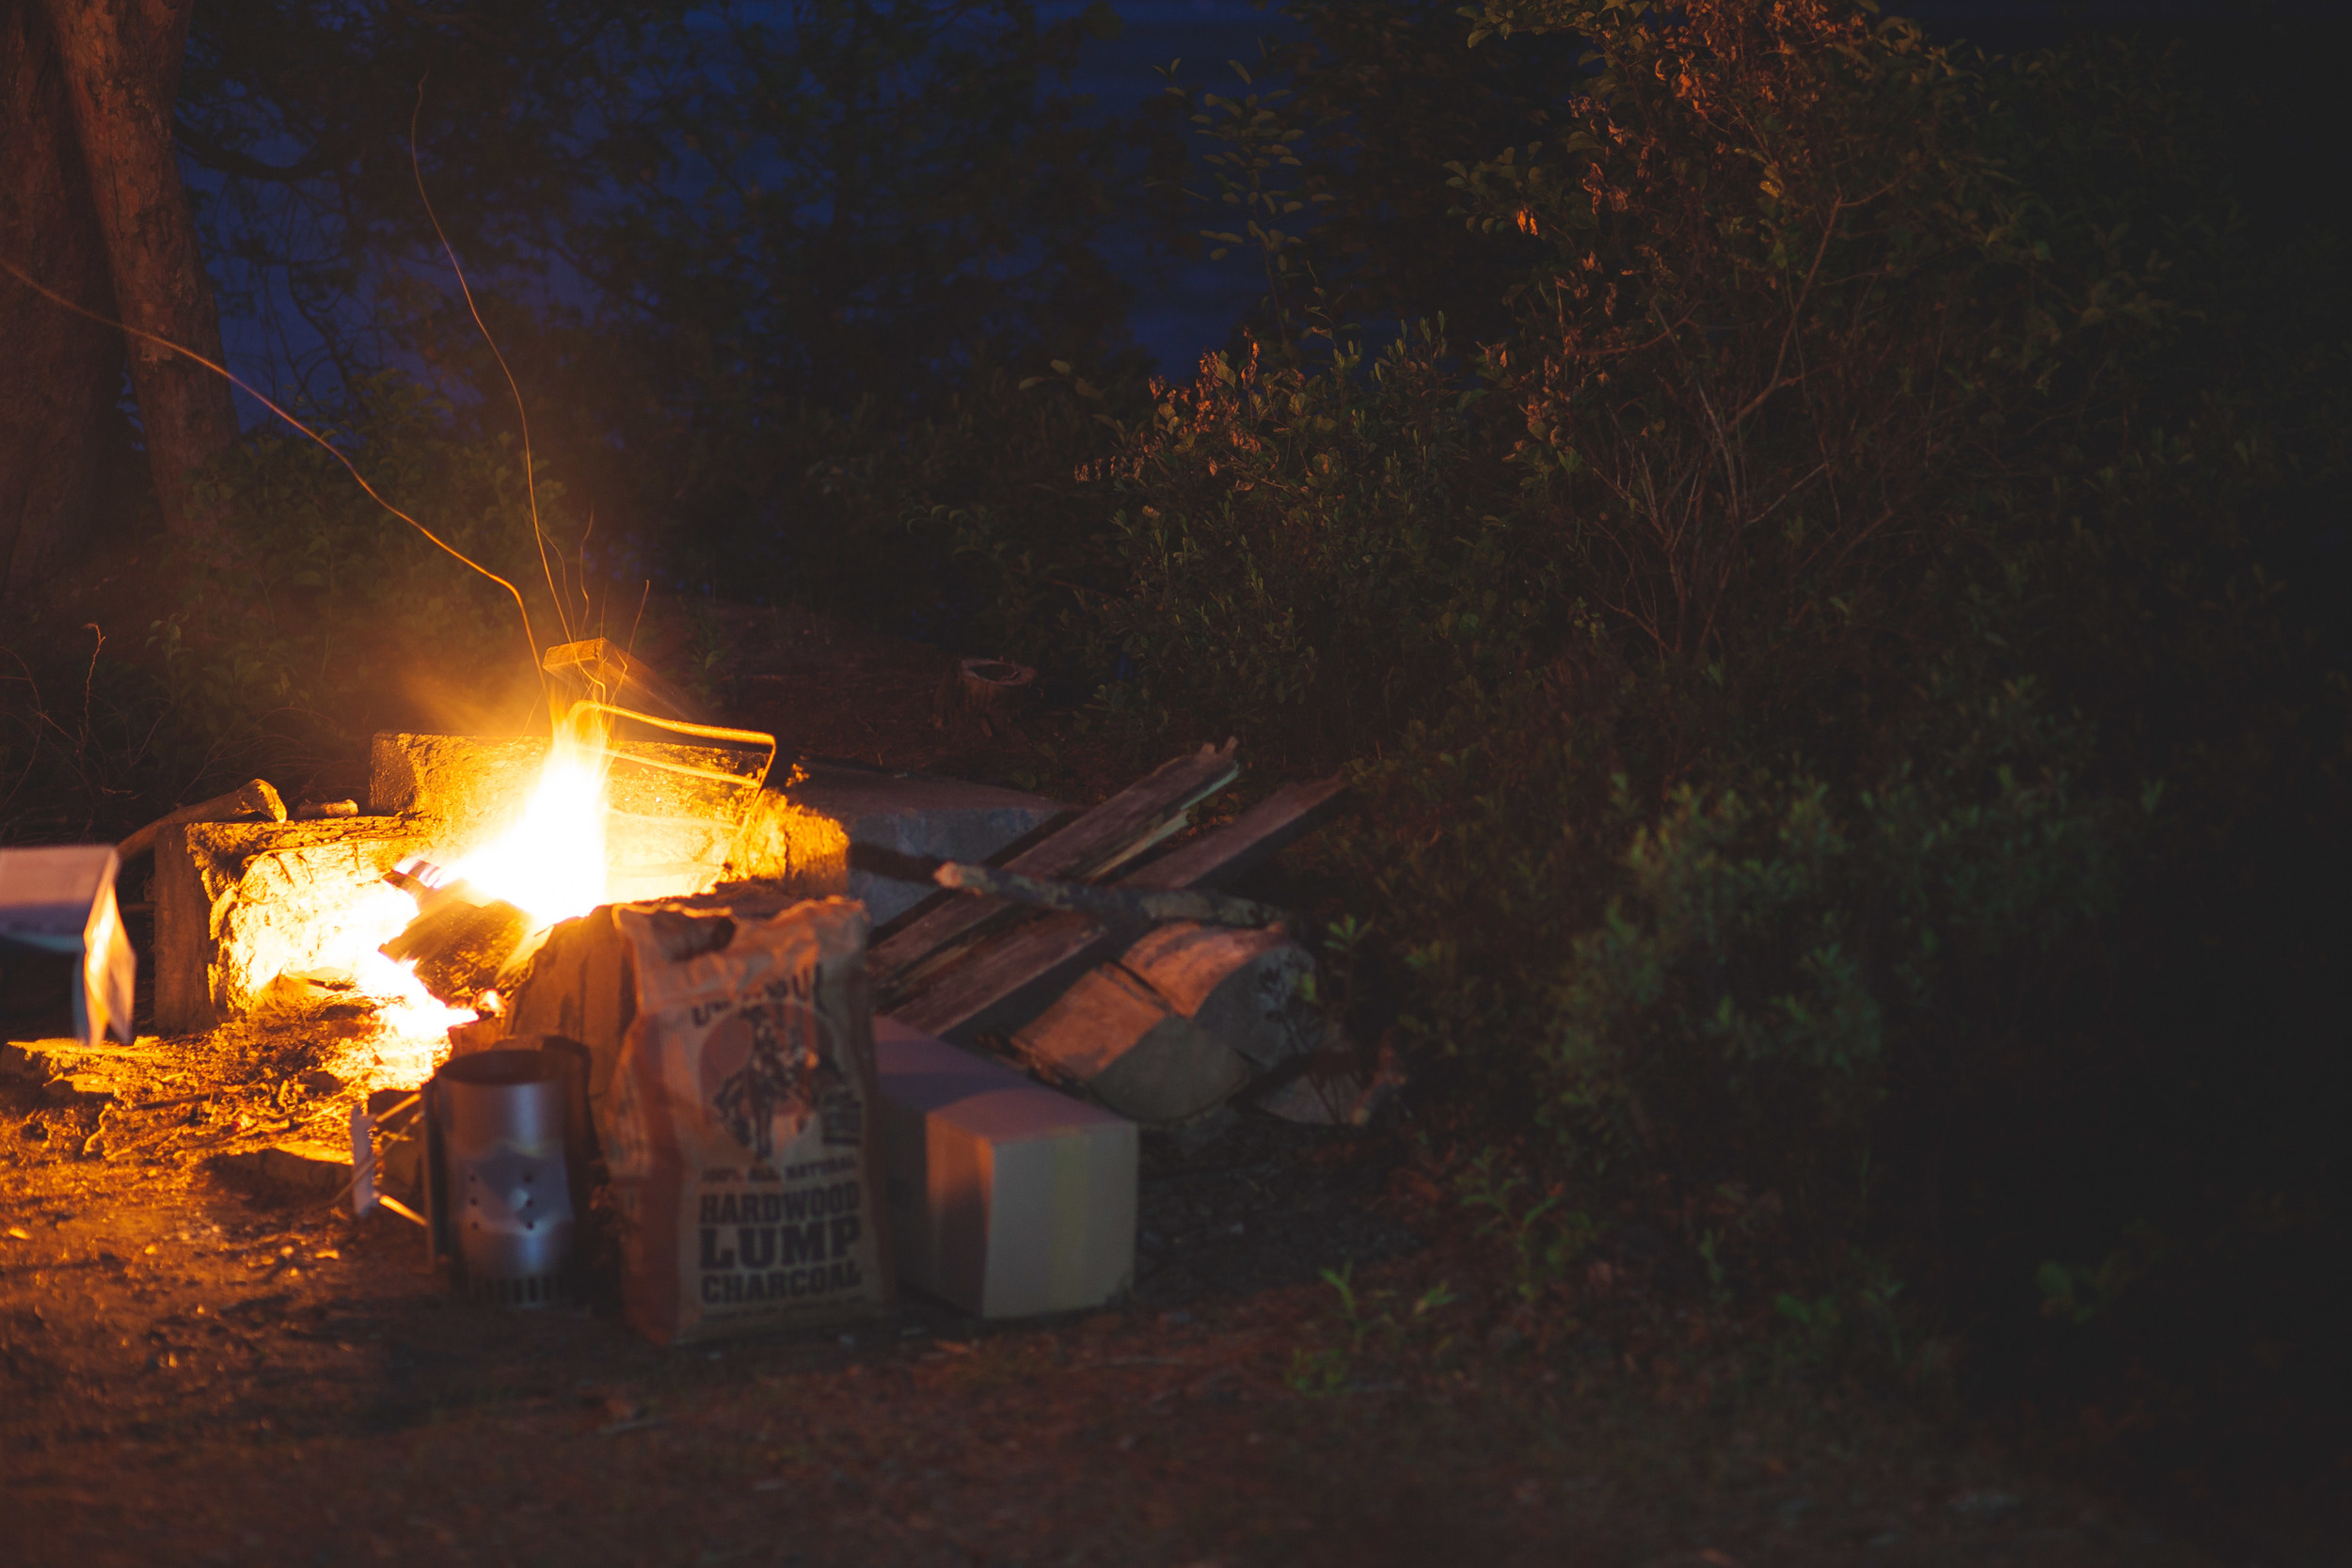 Late Night Camp Fire